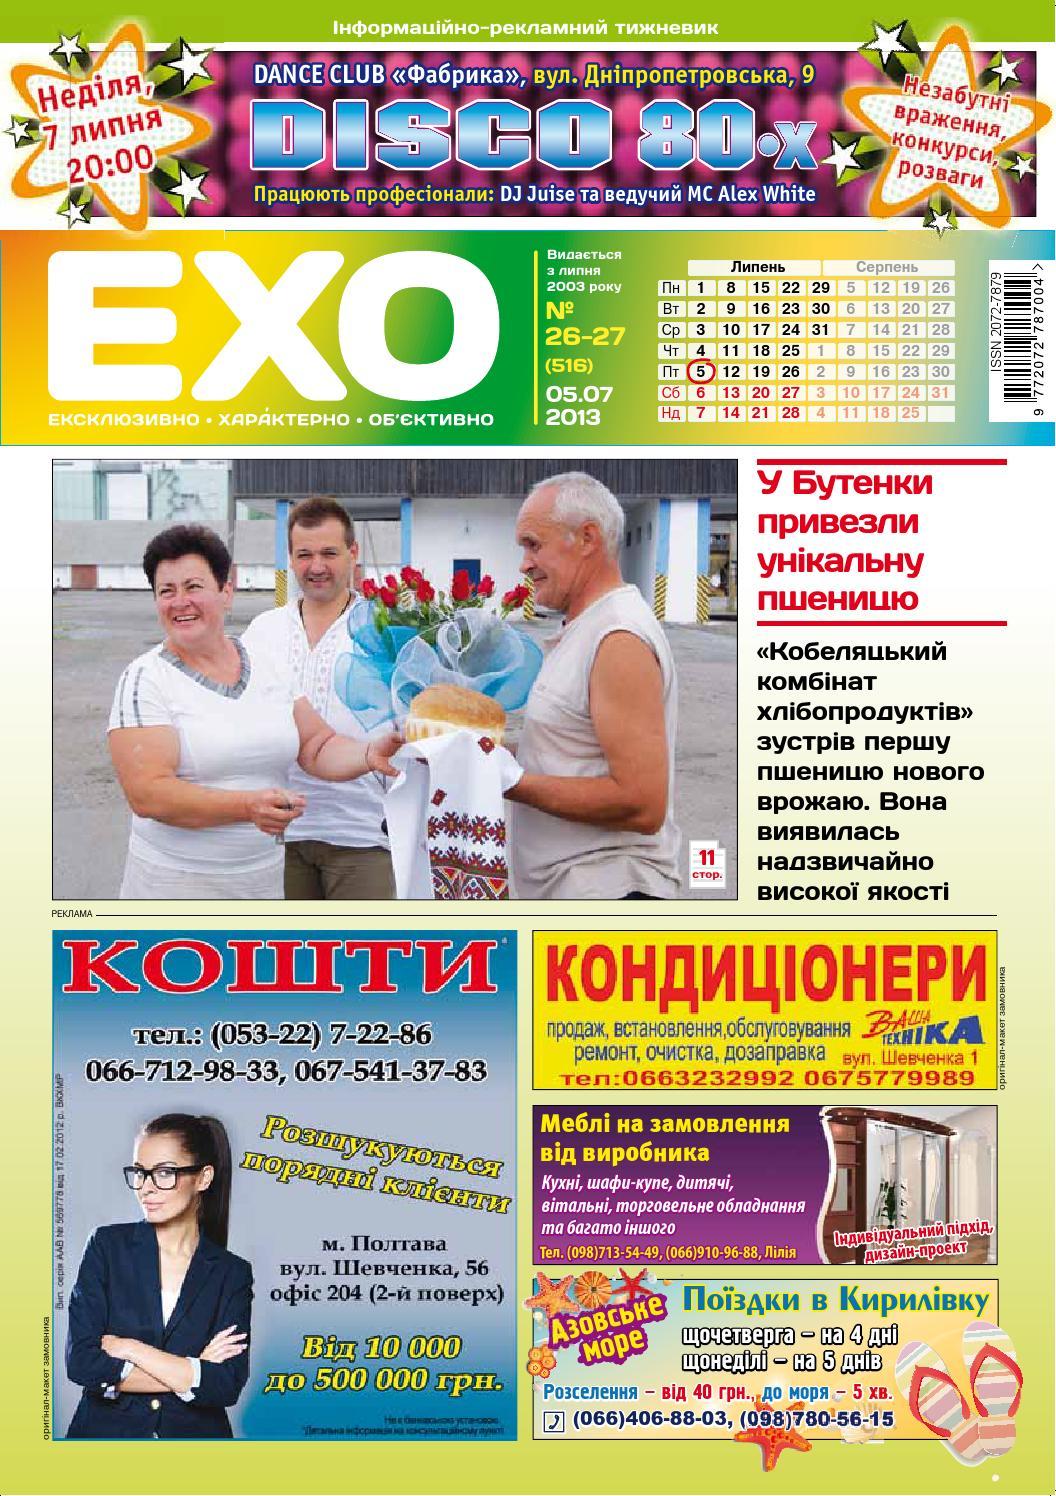 Exo 27 517 kob by Тижневик «ЕХО» - issuu f493c50b4ed14